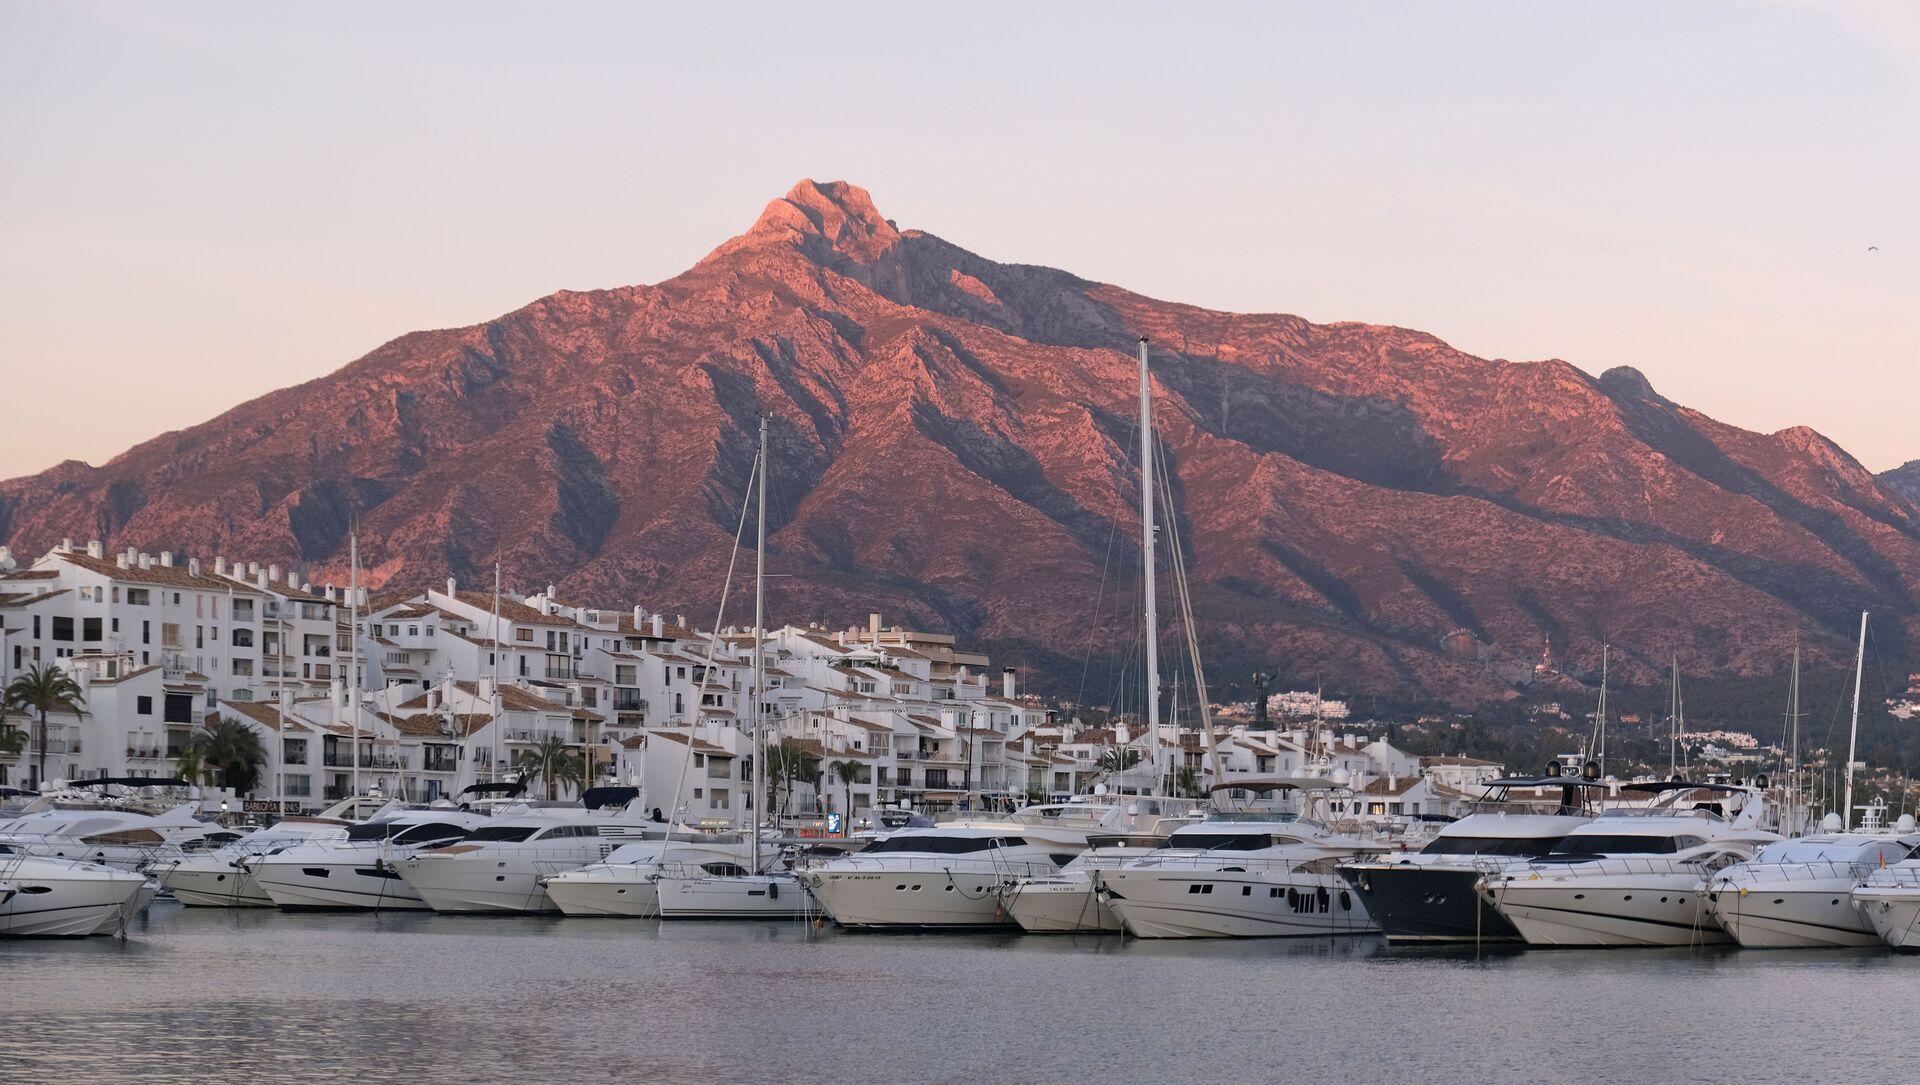 Costa del Sol, Marbella, Espagne - Sputnik France, 1920, 09.09.2021